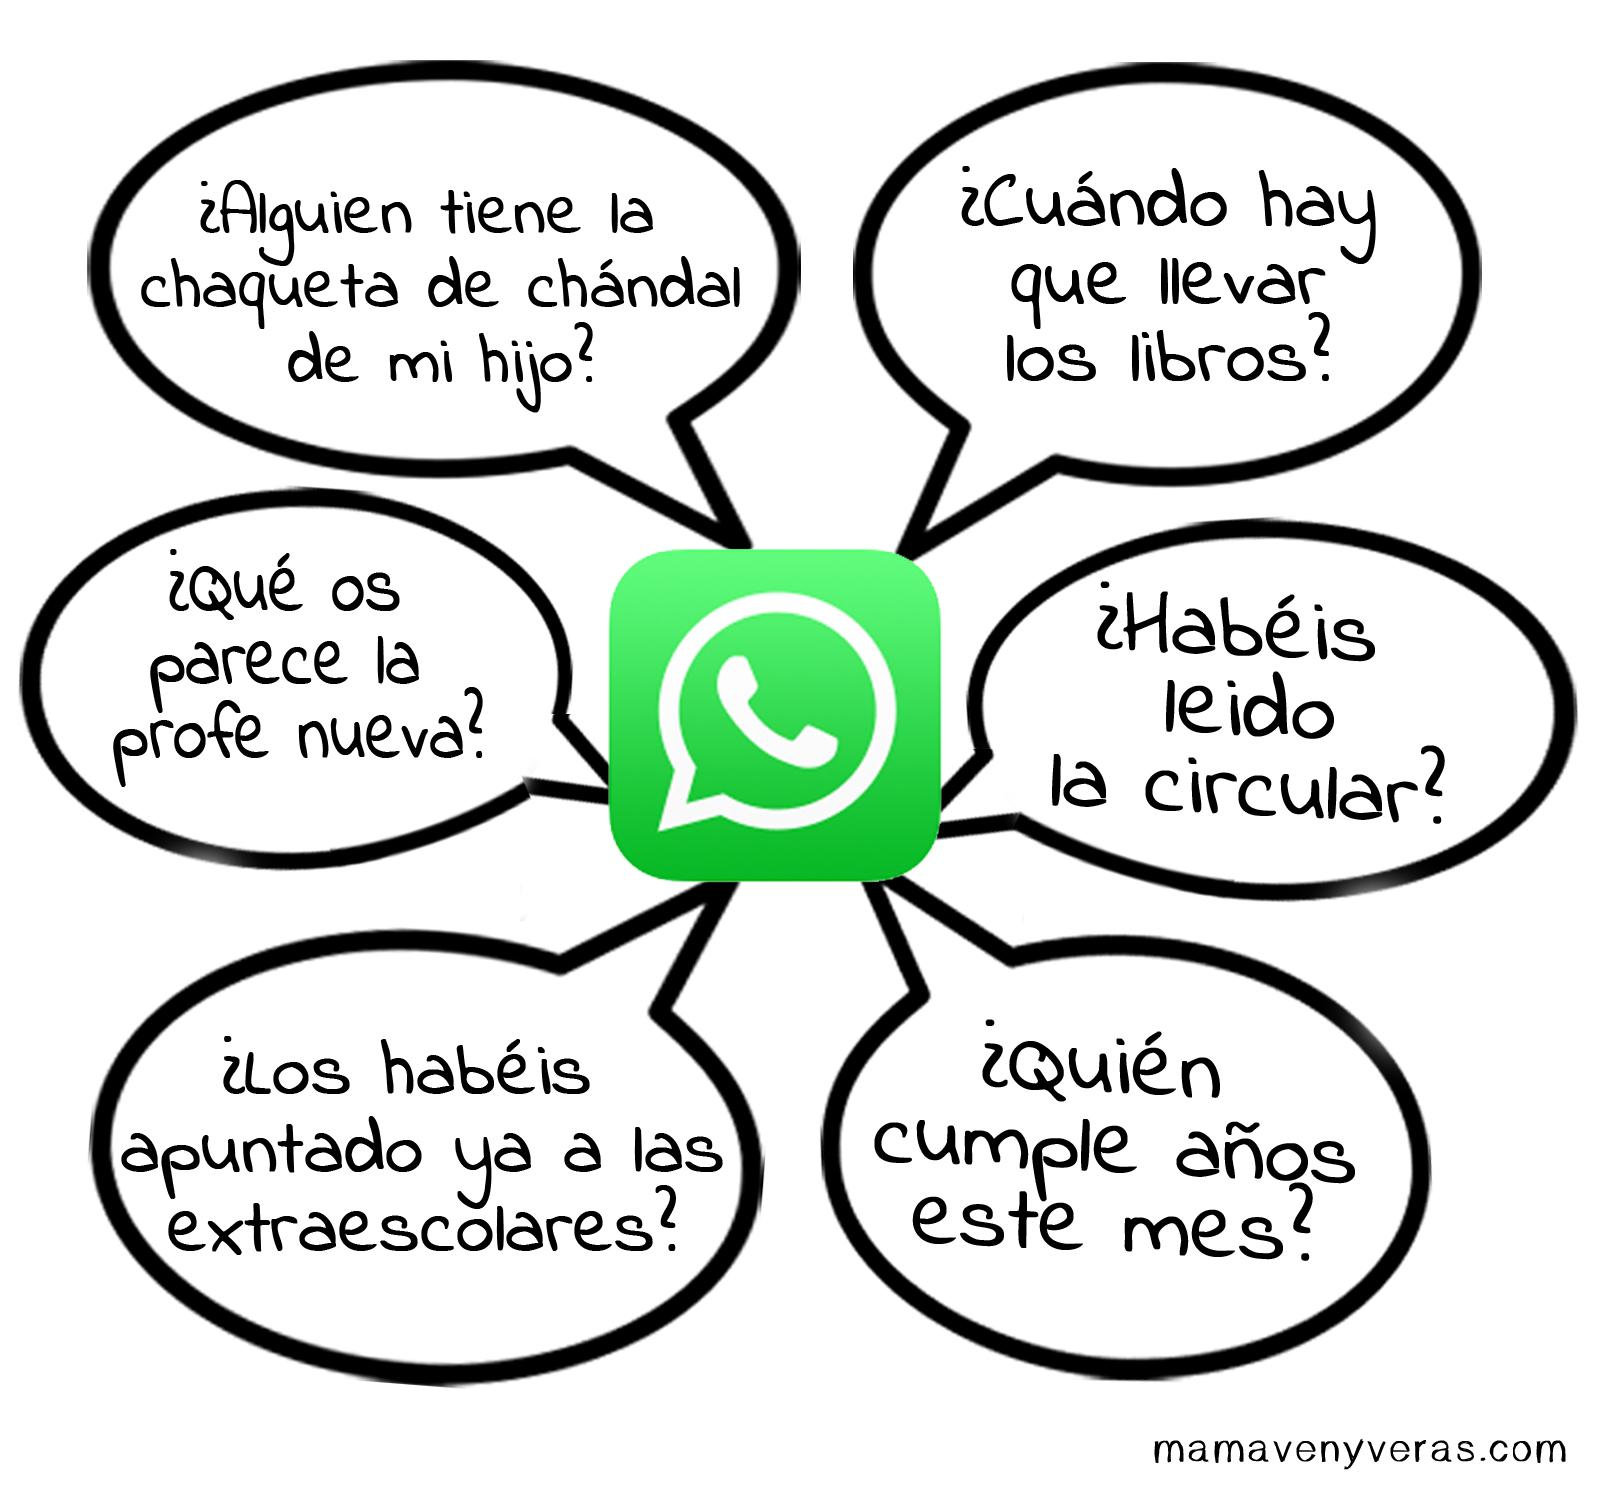 whatsapp venyveras